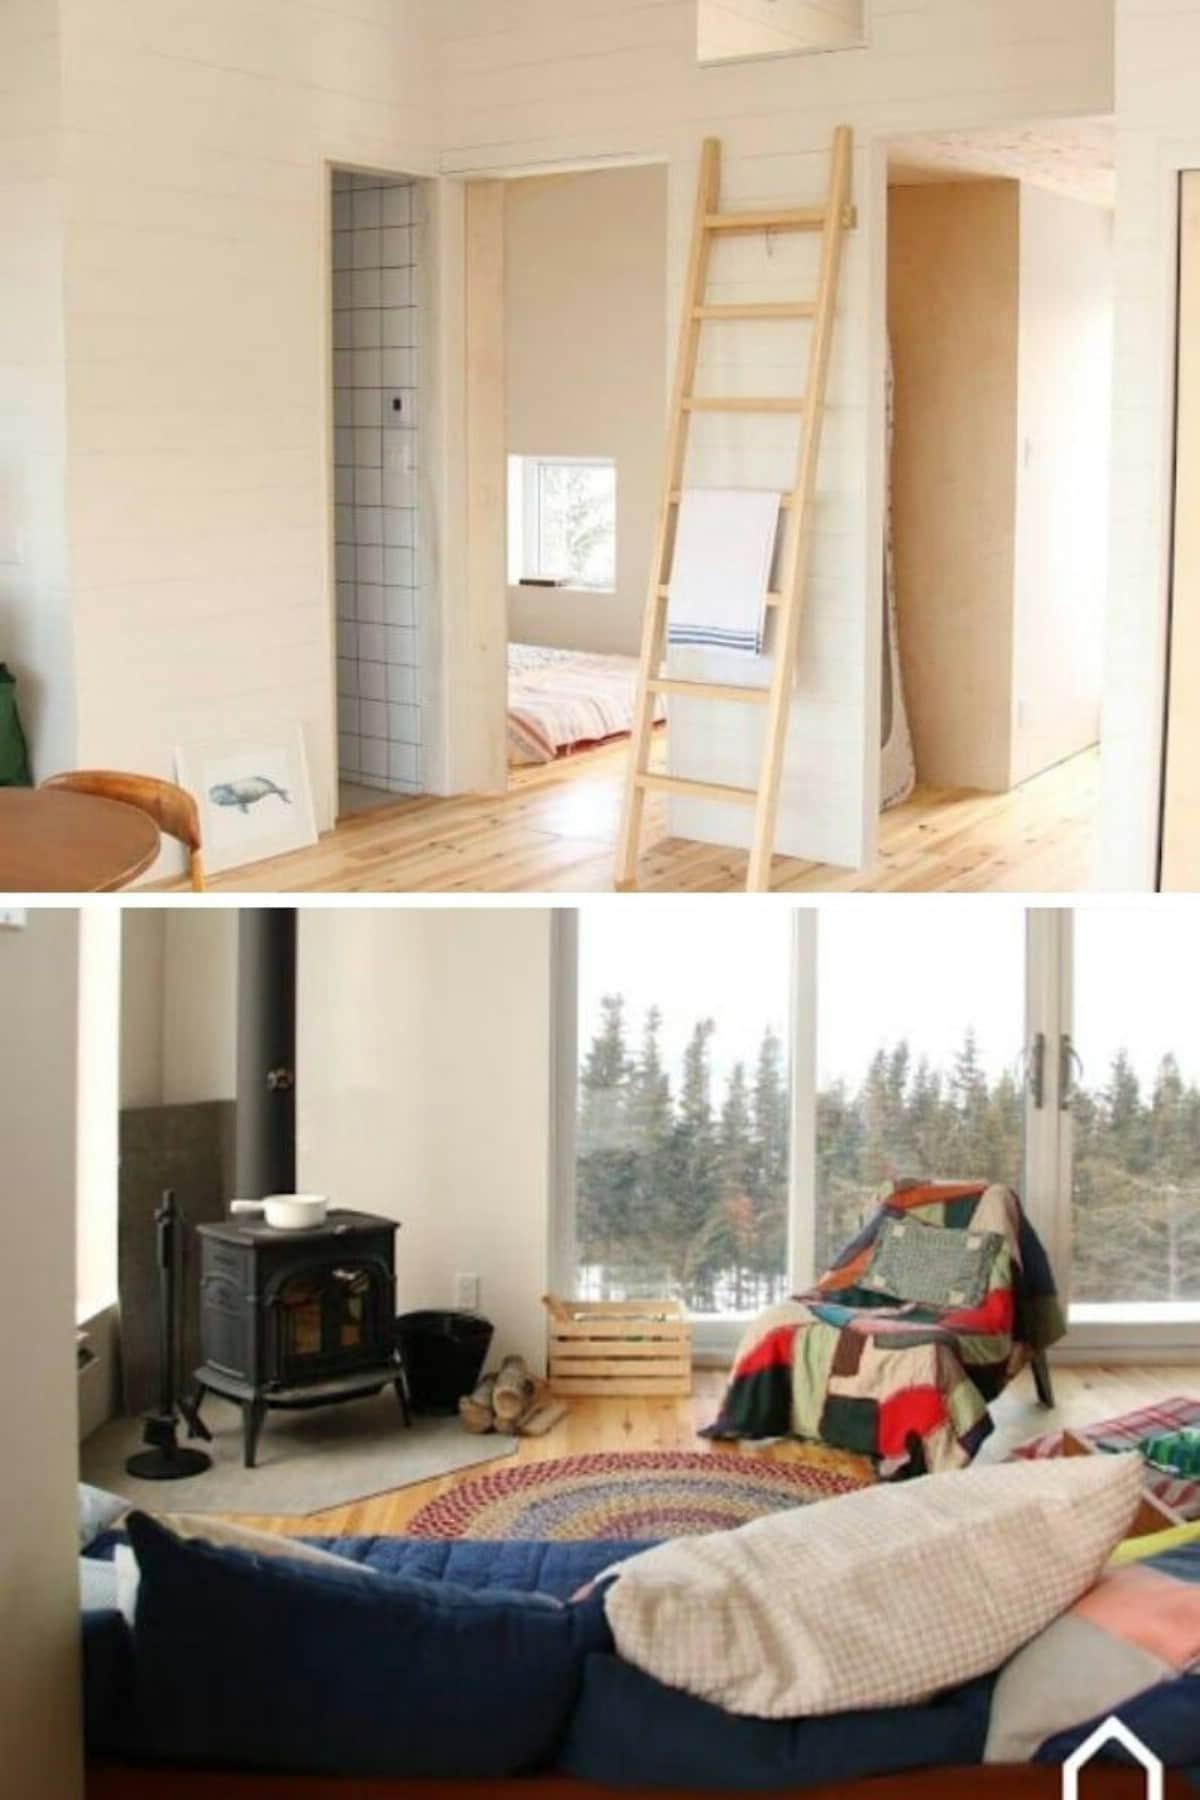 Ma Maison Logique 700-Square-Foot Tiny House